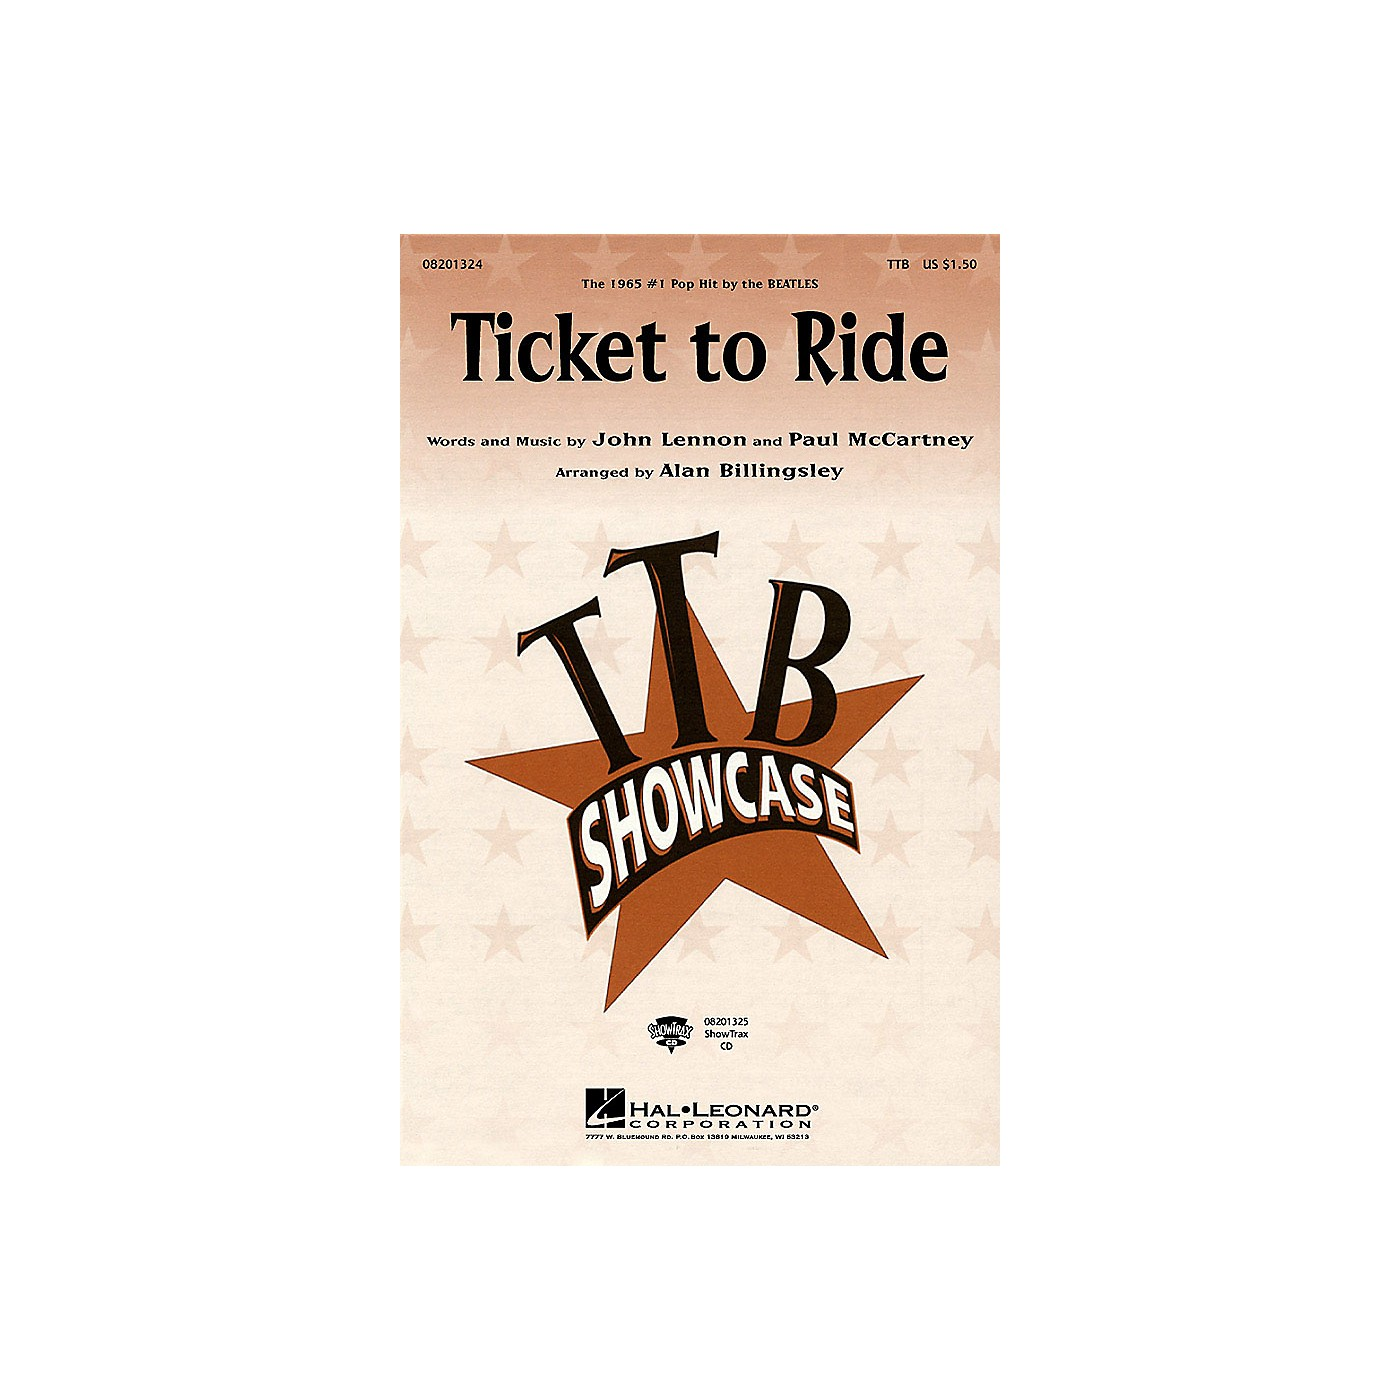 Hal Leonard Ticket to Ride TTB by The Beatles arranged by Alan Billingsley thumbnail